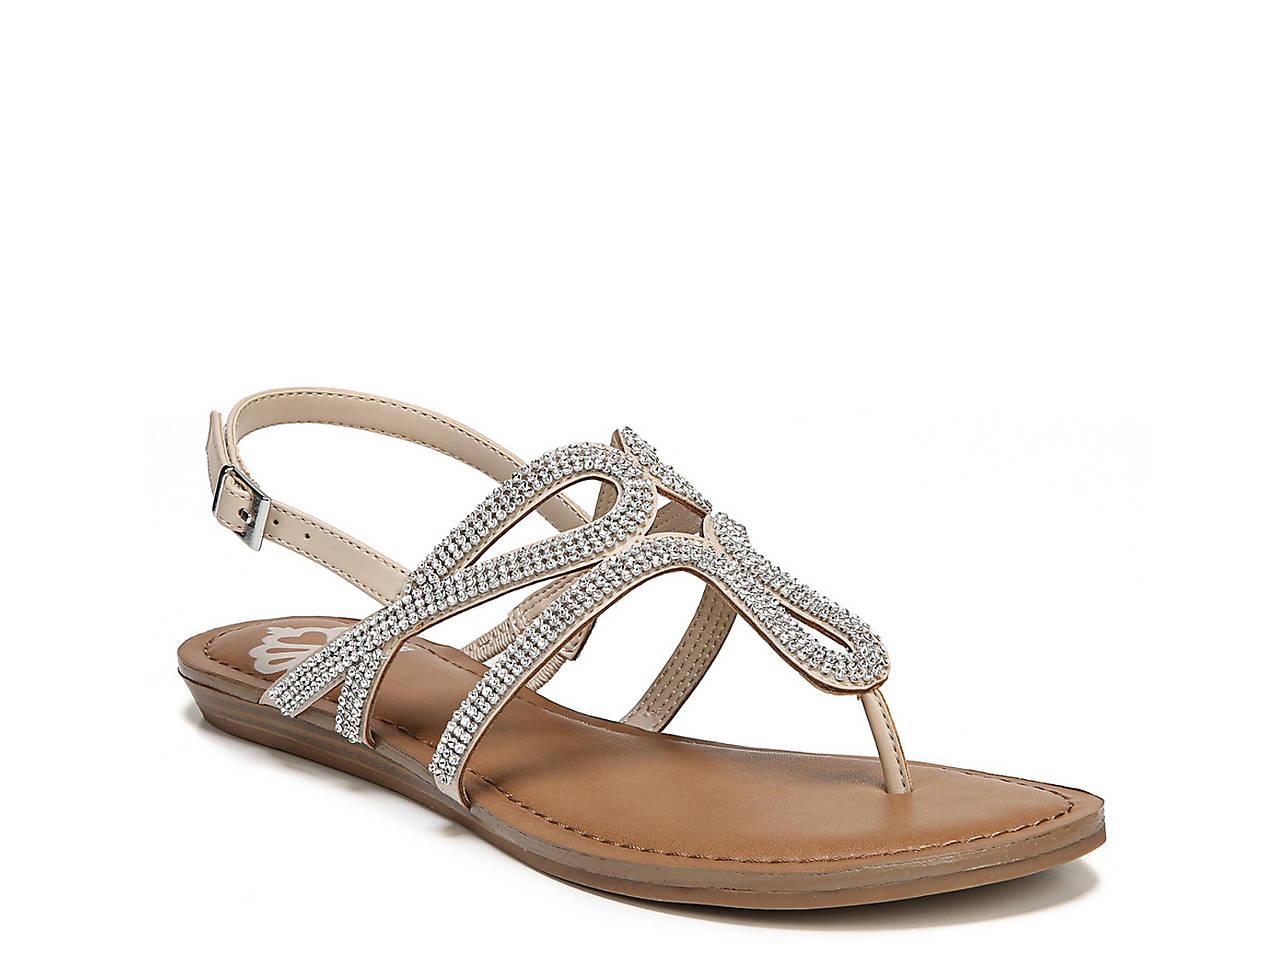 Shimmer Sandal by Fergalicious